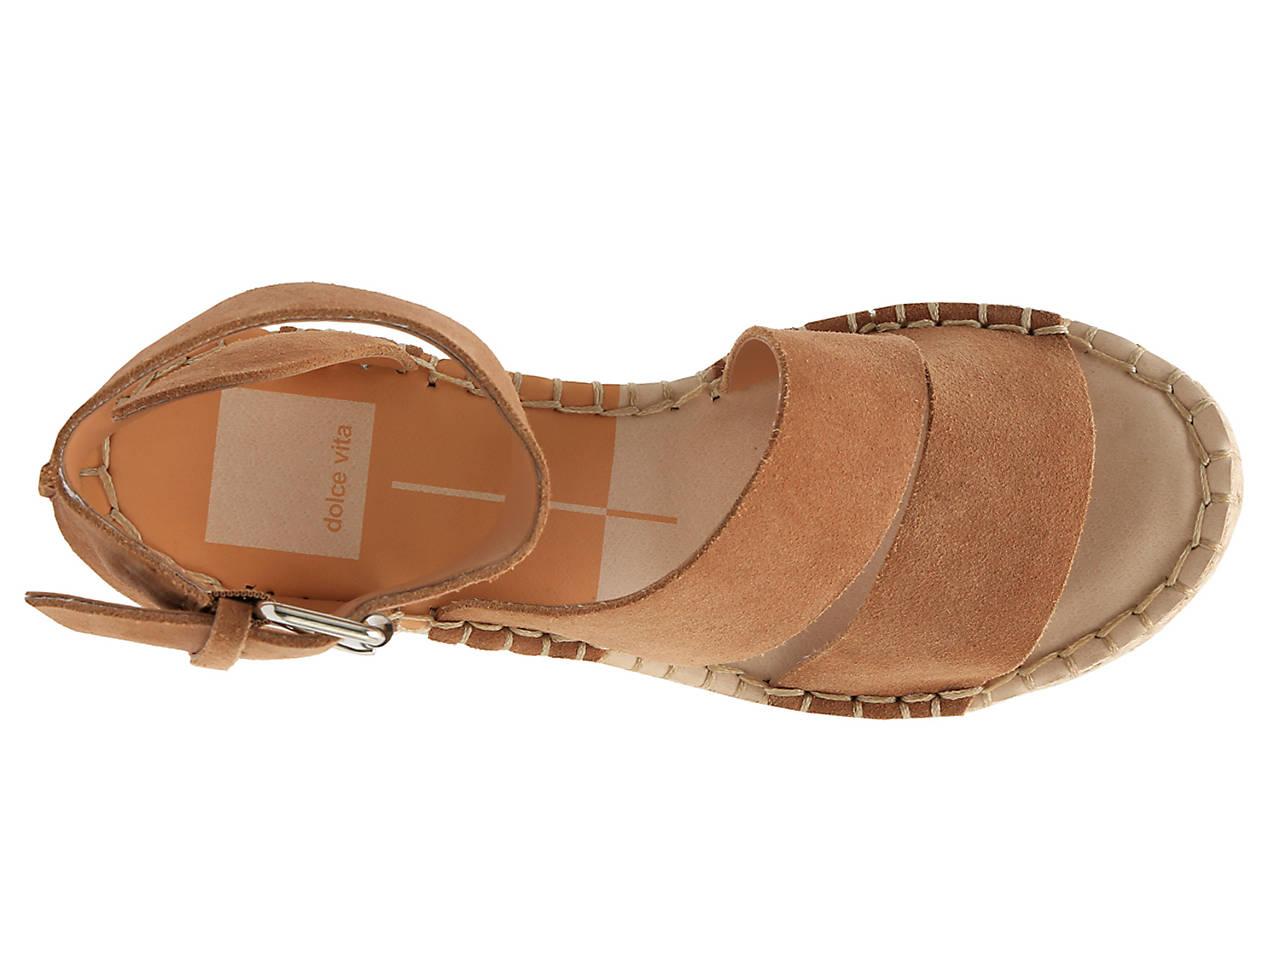 7b7aa7e3330 Dolce Vita Shayla Espadrille Wedge Sandal Women s Shoes